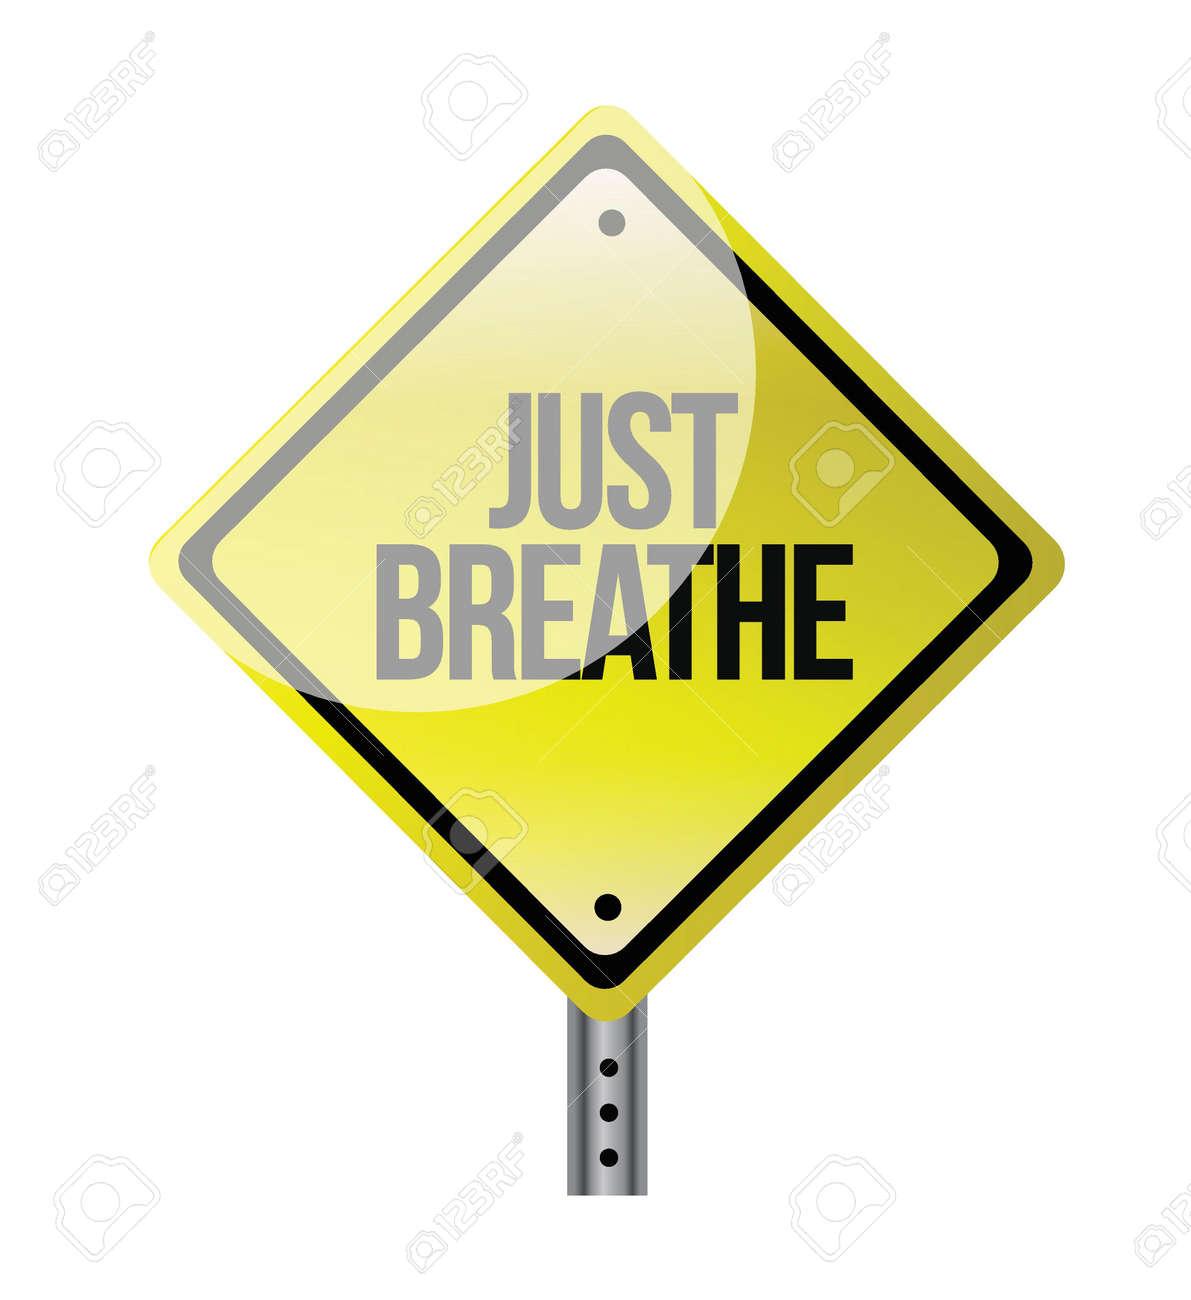 Just Breathe road sign illustration design over white Stock Vector - 20760527